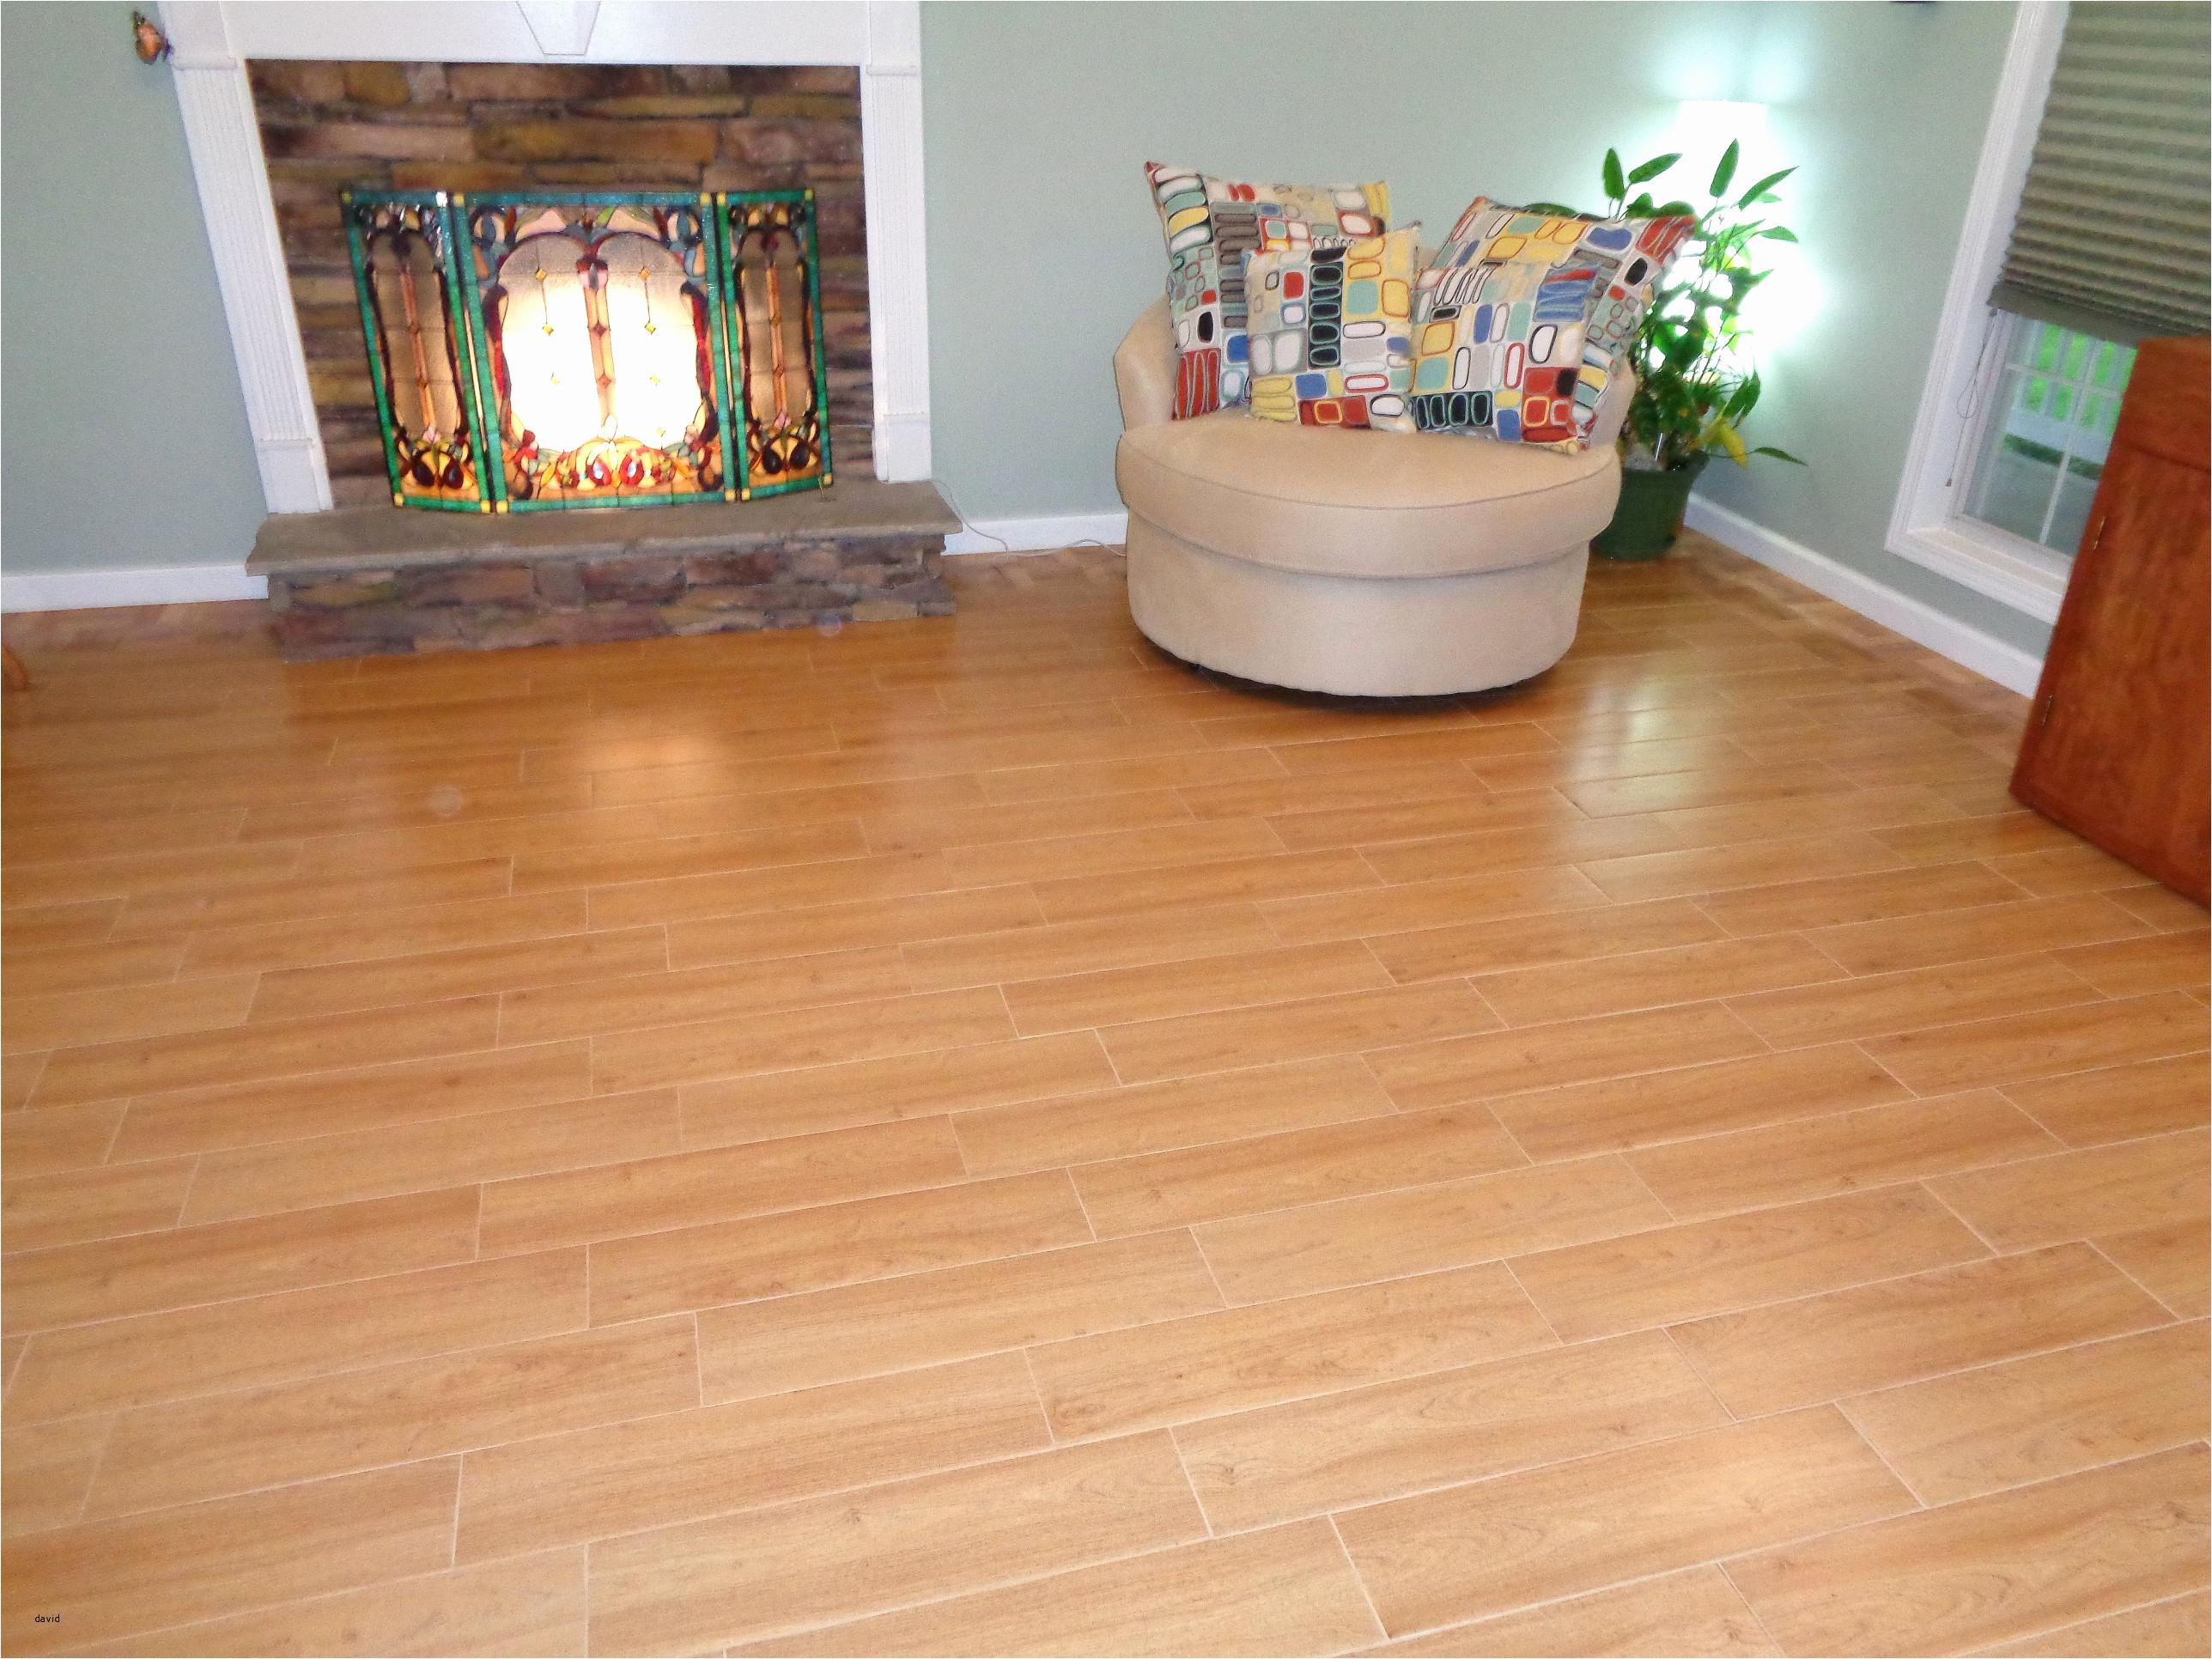 polyurethane finish hardwood floors of 25 top laminate flooring image with discount laminate flooring laminate wood flooring sale best clearance flooring 0d unique